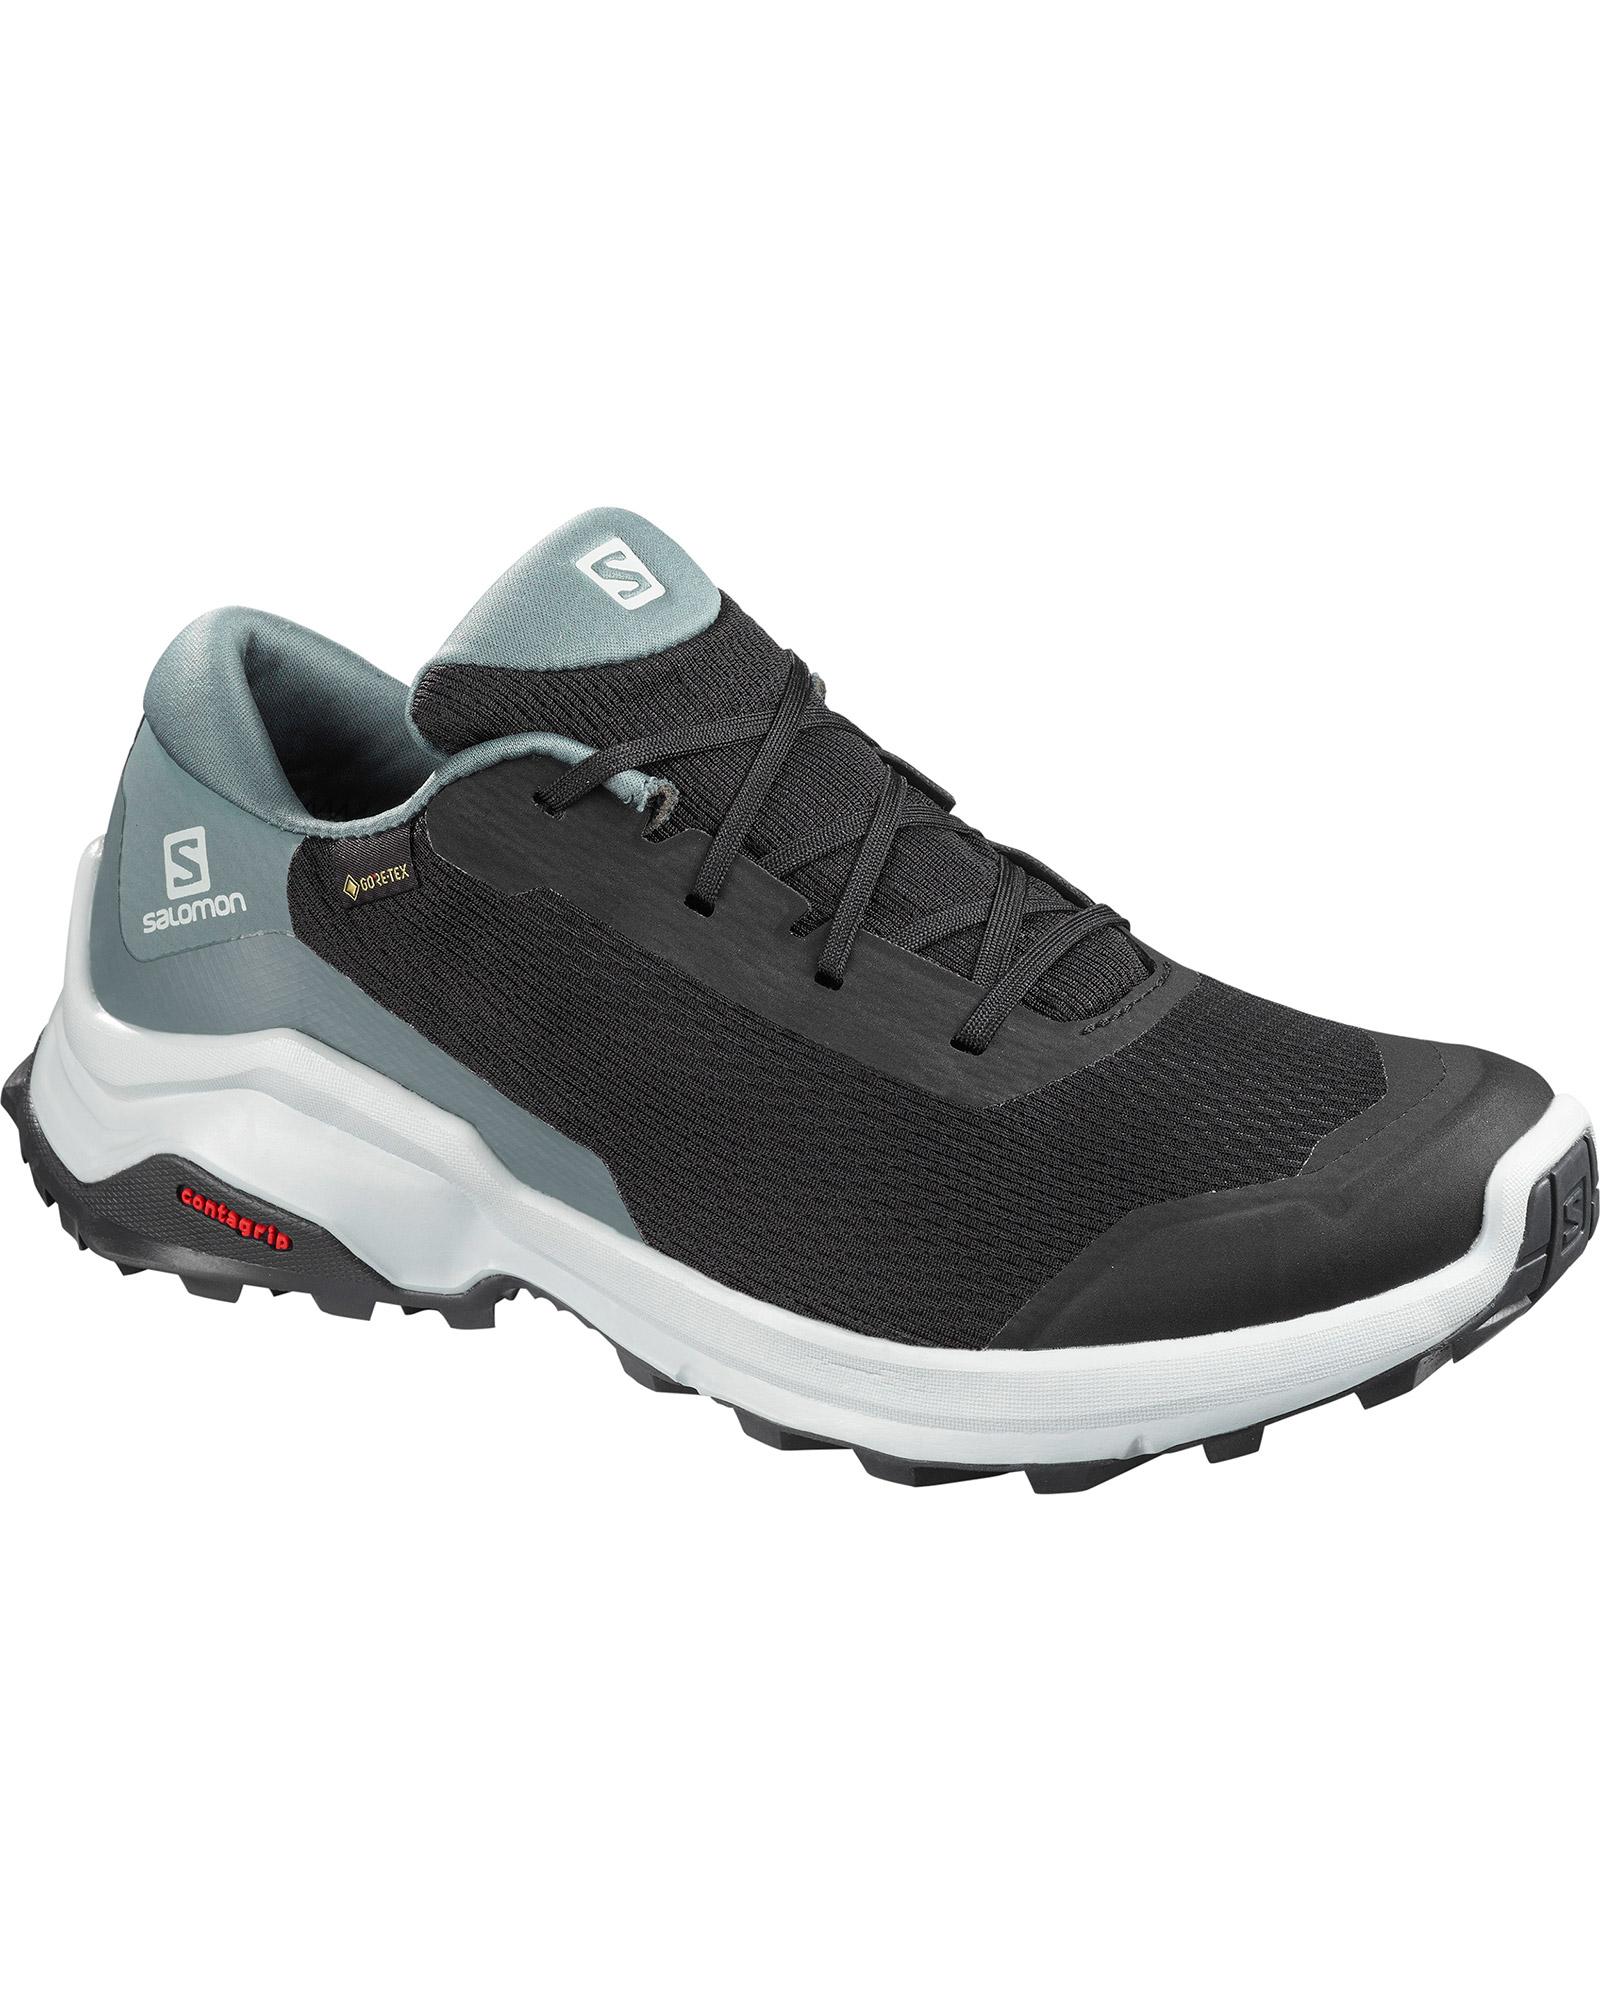 Salomon Women's X Reveal GORE-TEX Walking Shoes 0